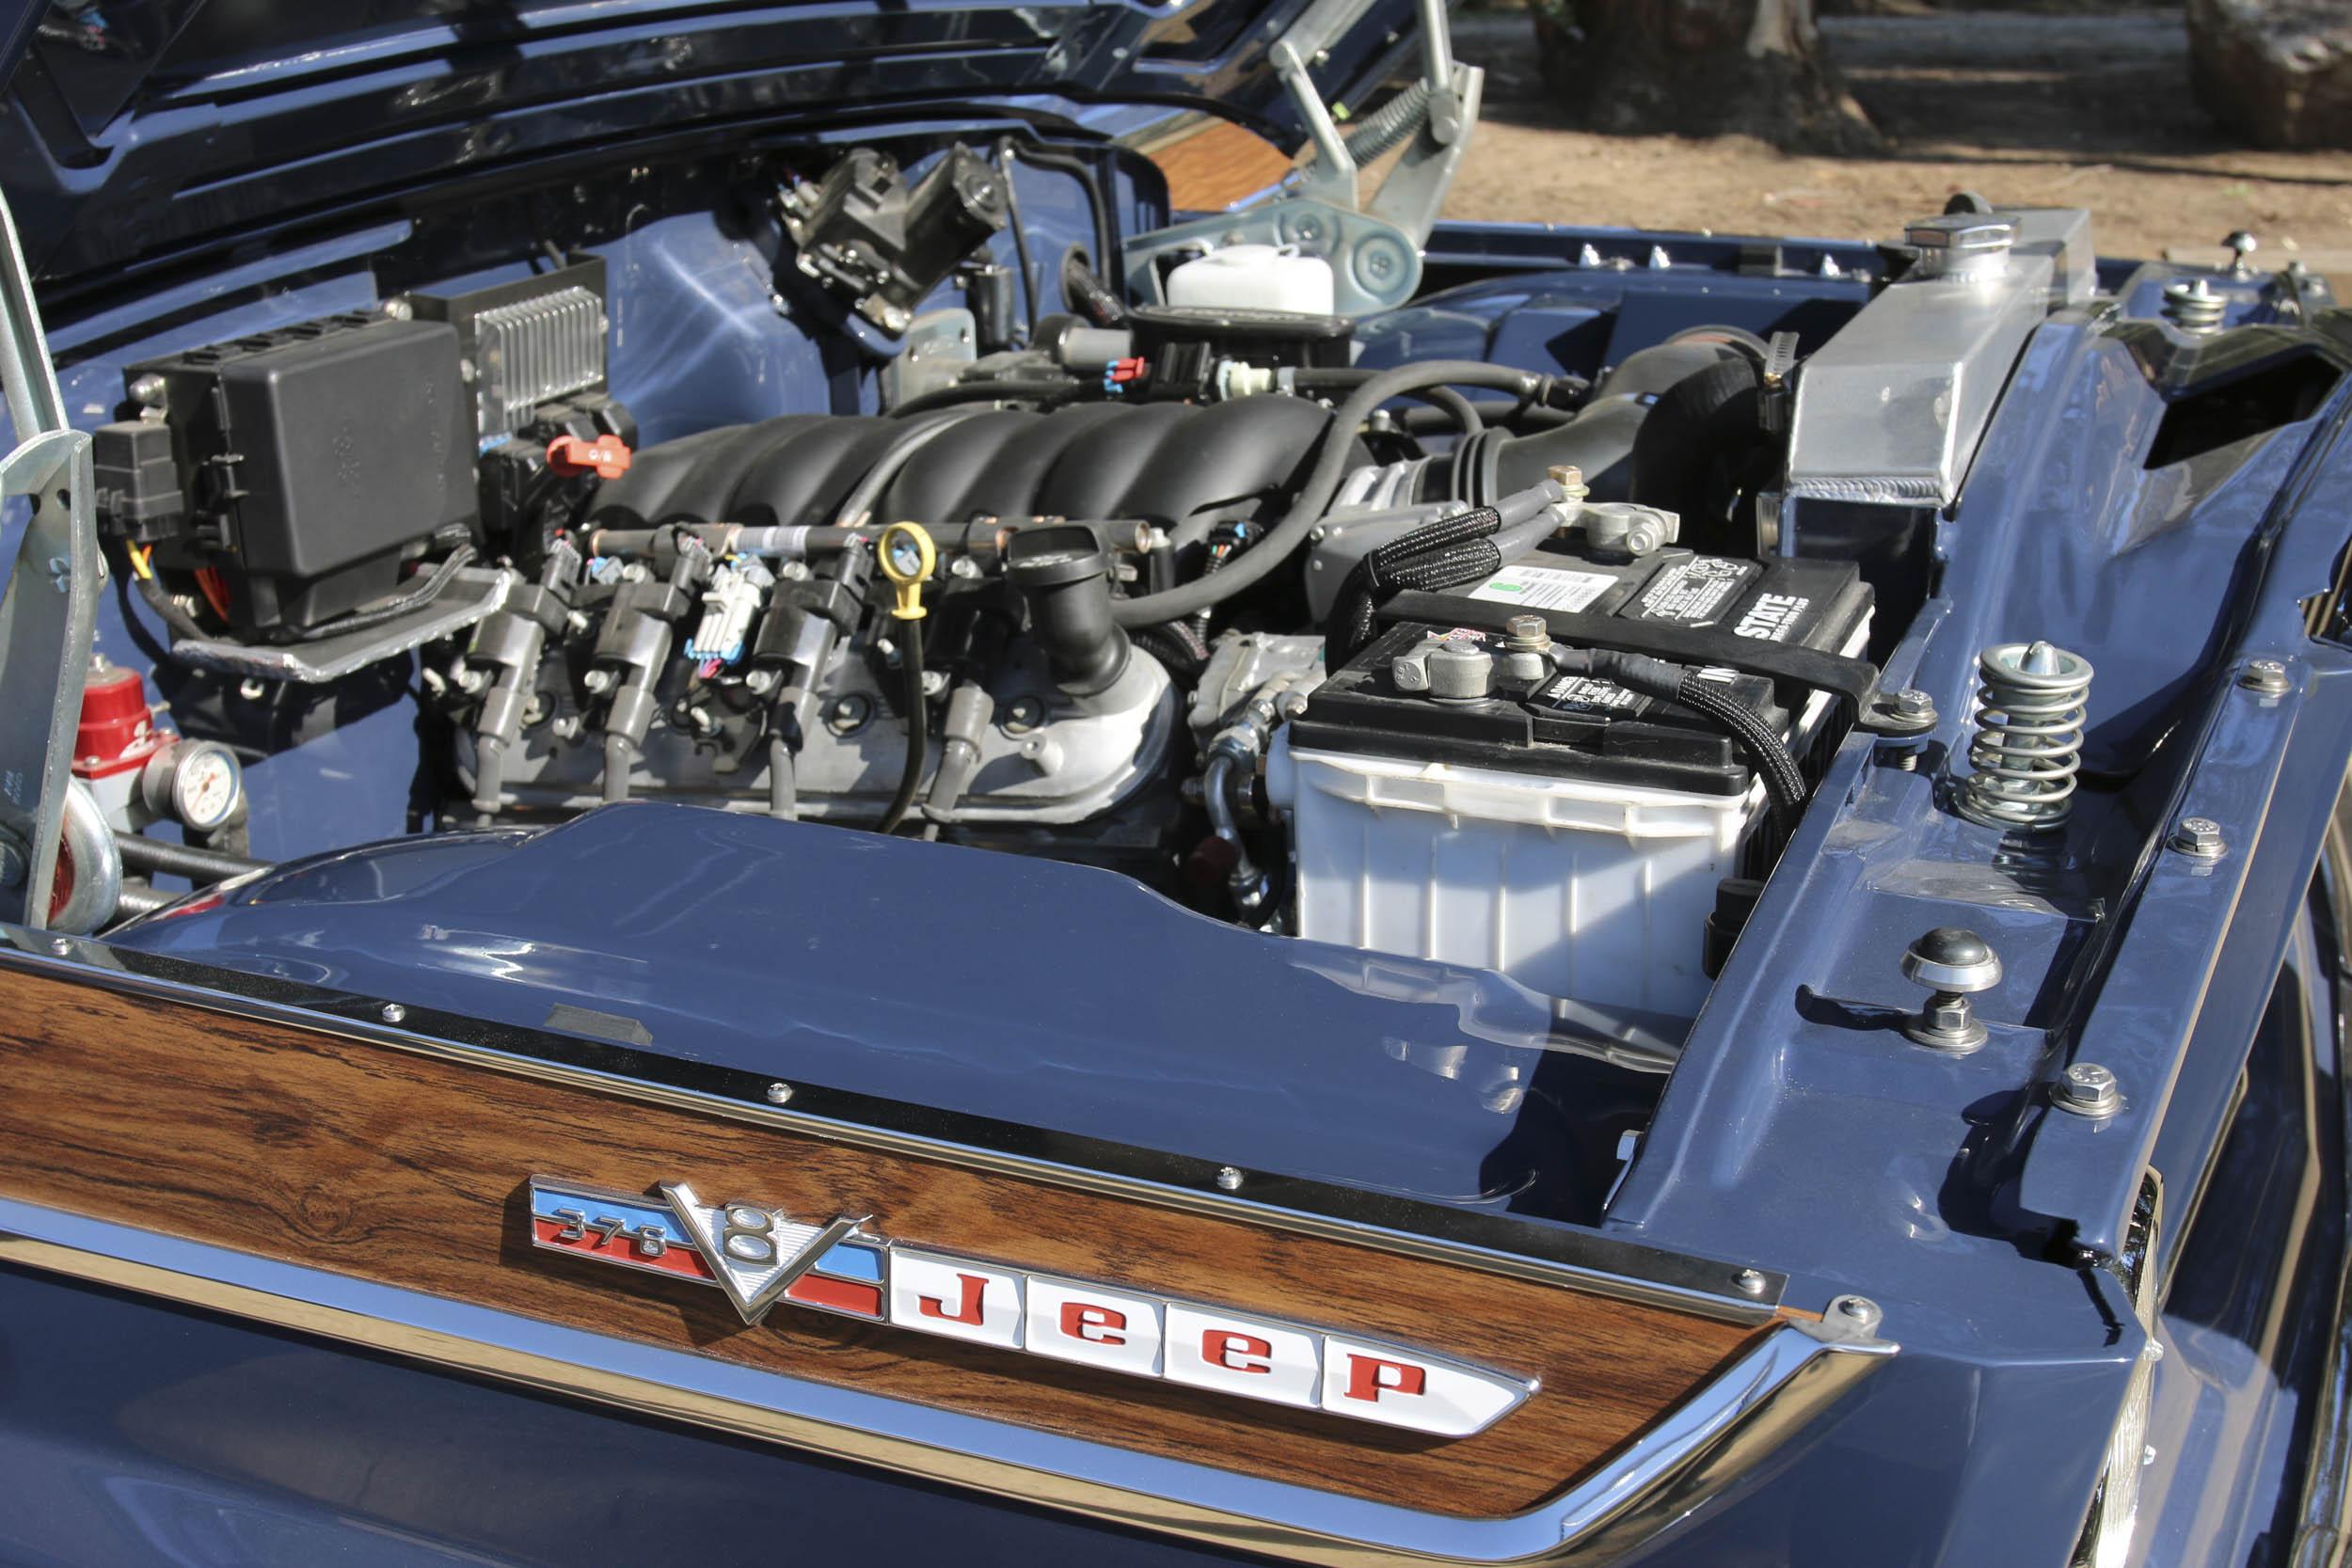 ICON Wagoneer engine